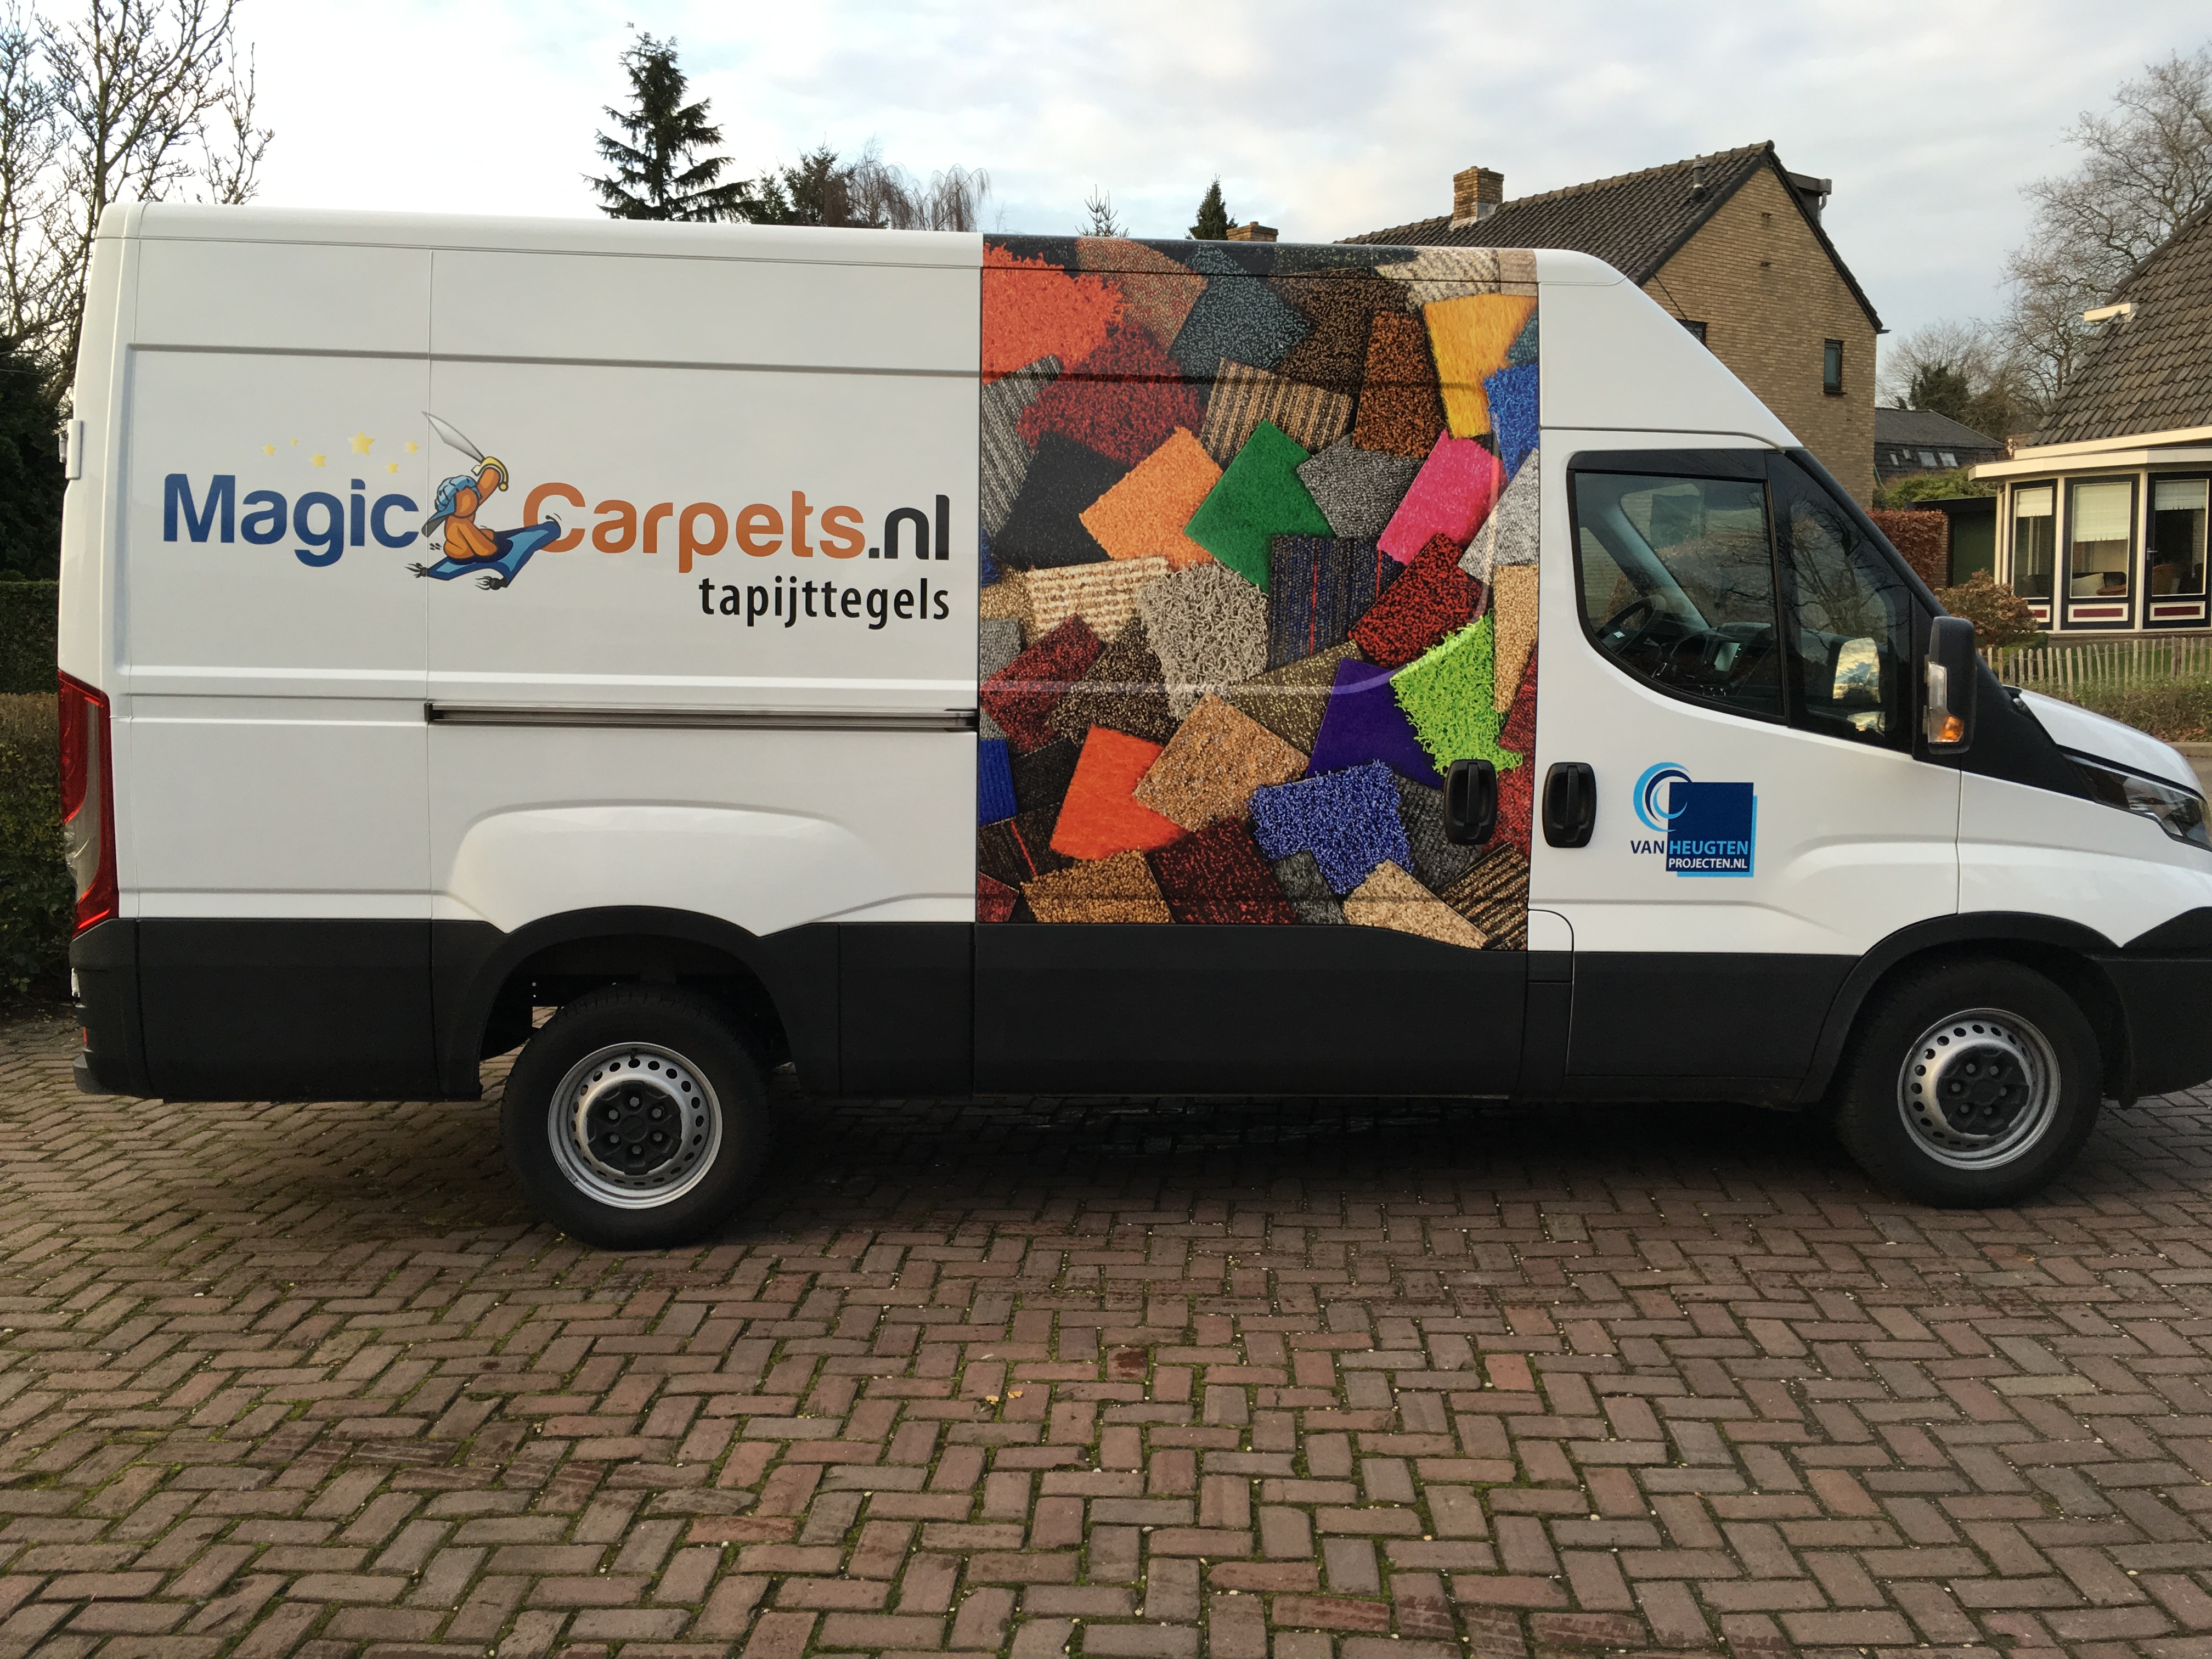 Autobelettering magiccarpets